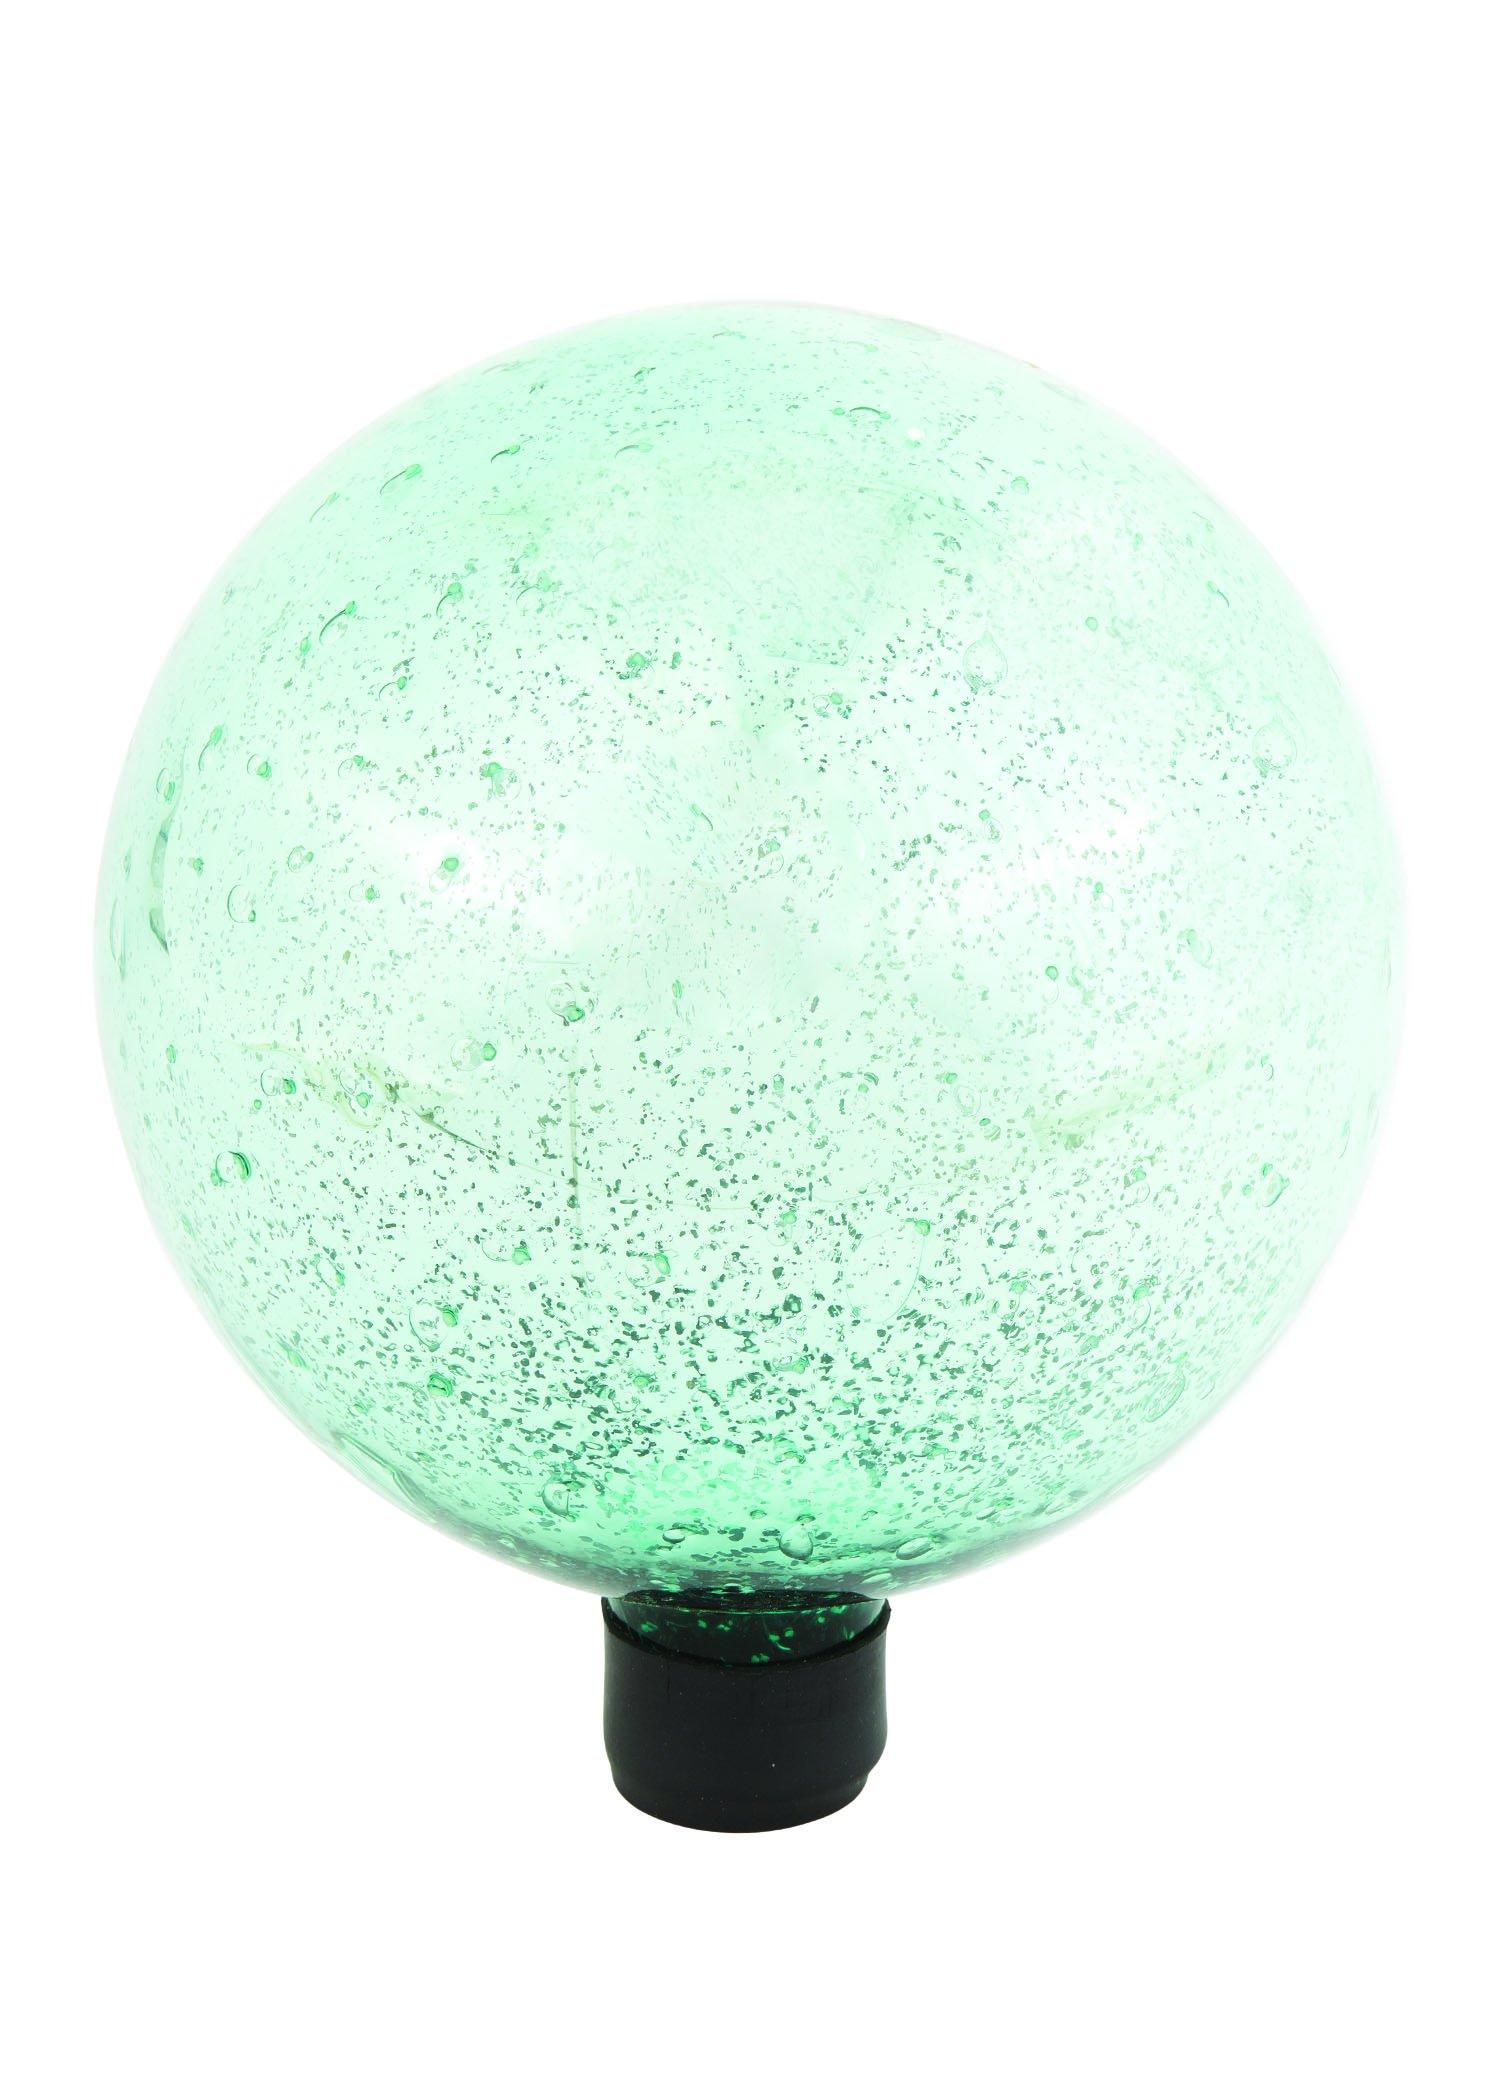 Russco III GD137210 Glass Gazing Ball, 10'', Green with Silver